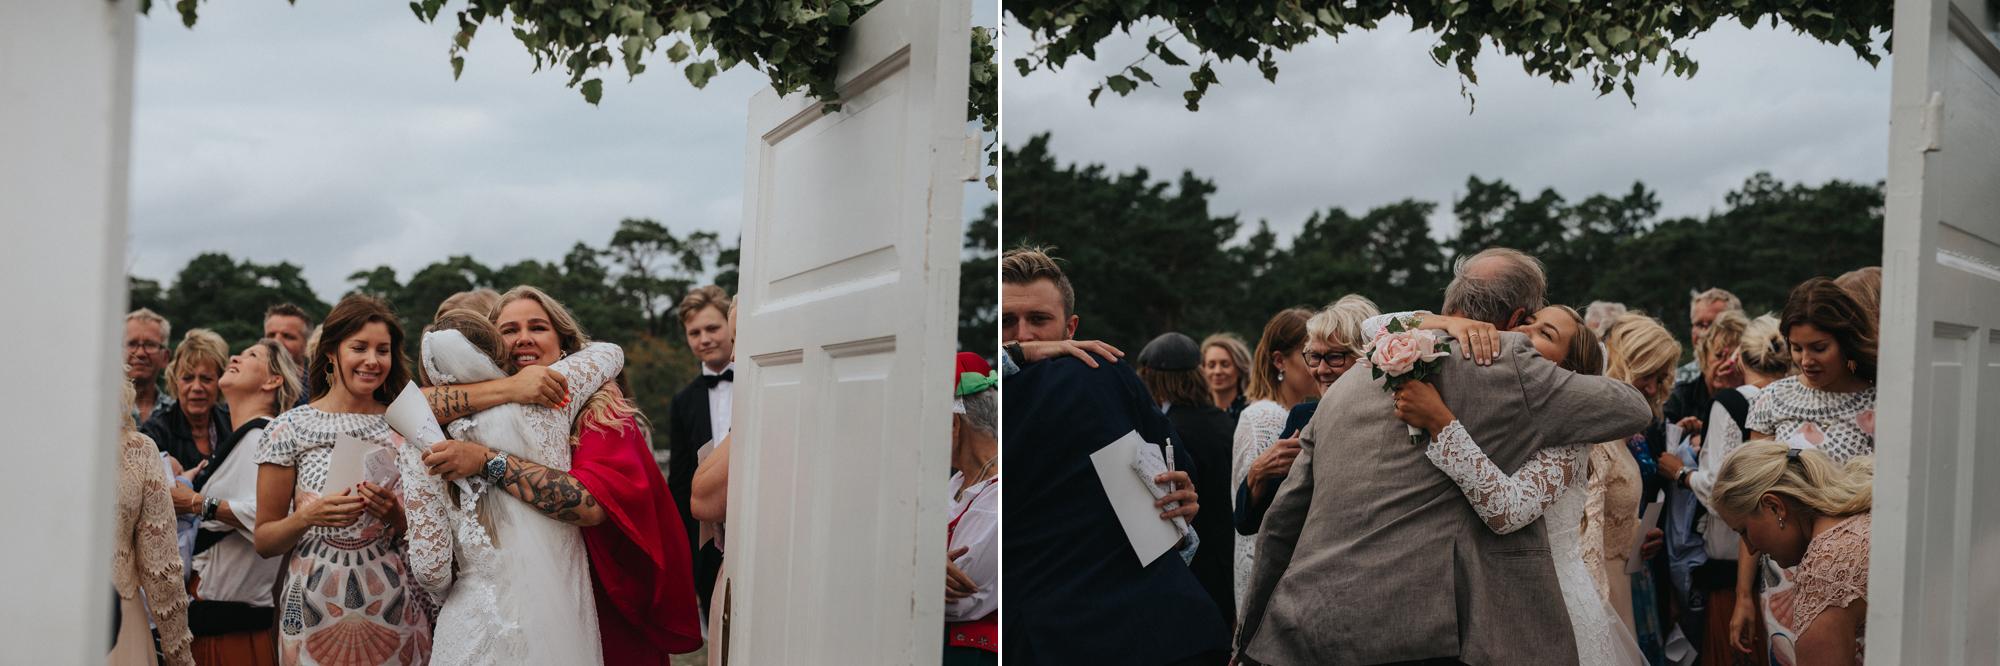 038-bröllopsfotograf-folhammar-gotland-neas-fotografi.jpg